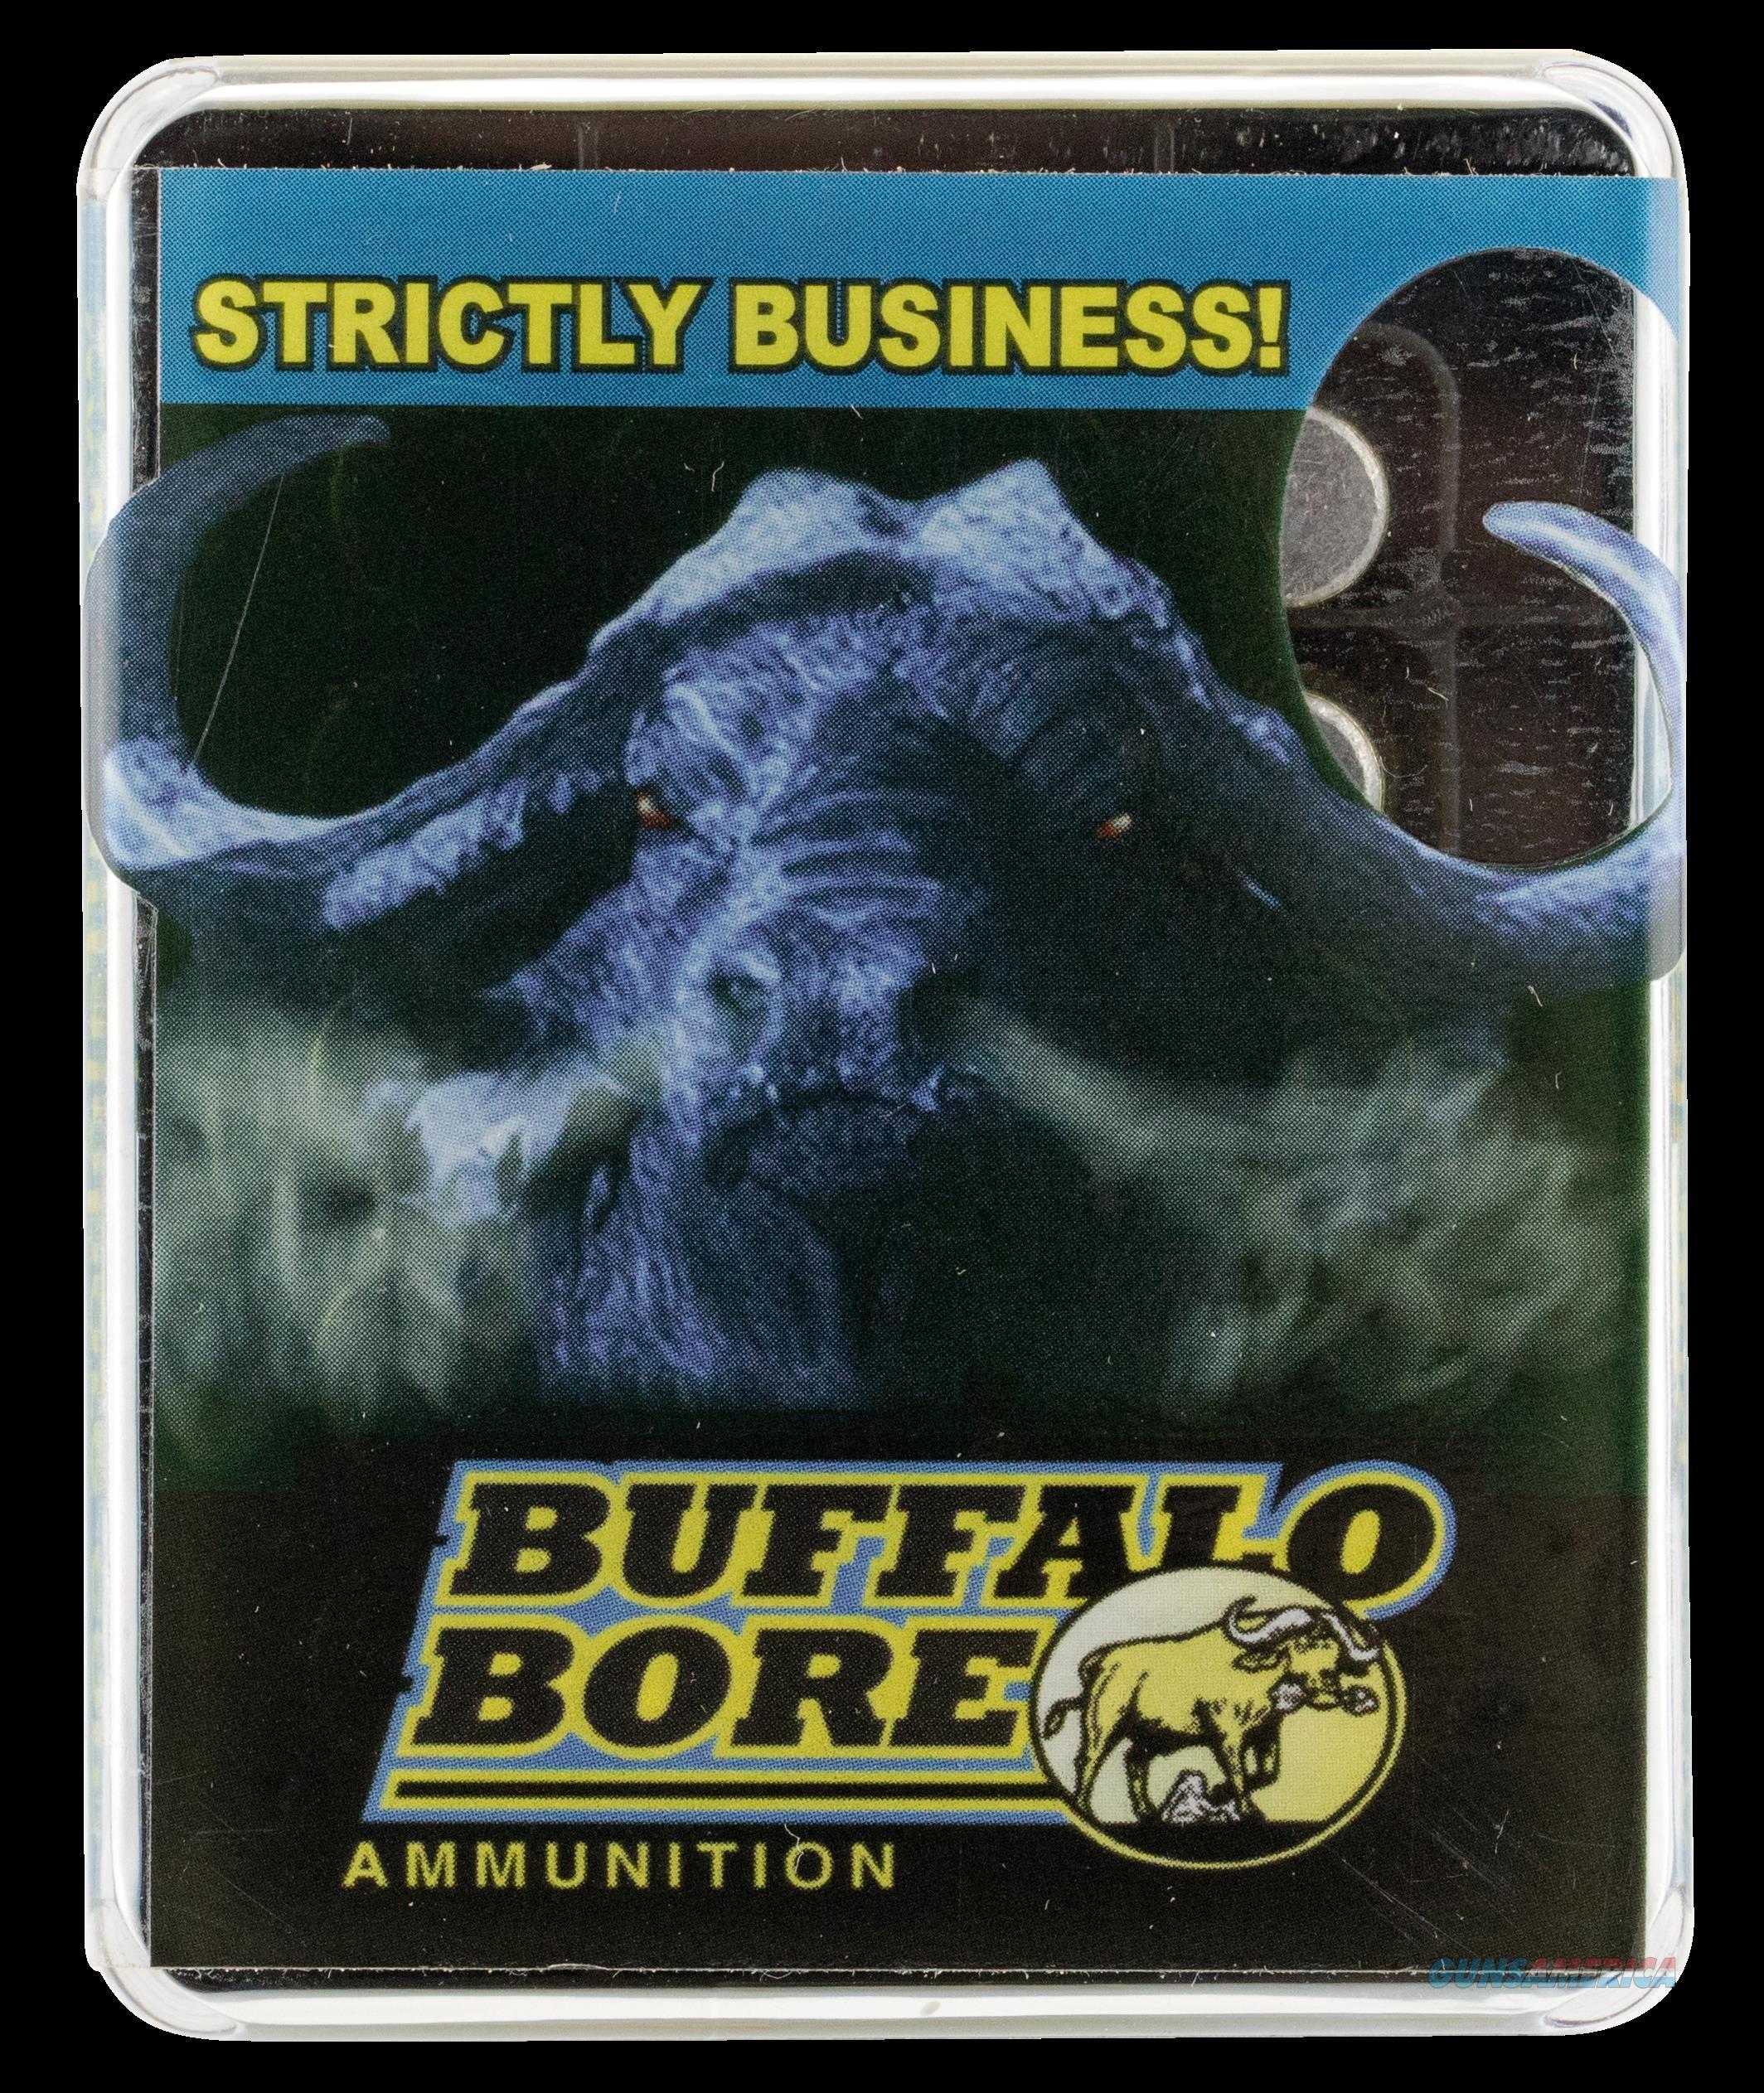 Buffalo Bore Ammunition Pistol, Bba 18b-20 500sw 440 Hcast Lfngc 20-12  Guns > Pistols > 1911 Pistol Copies (non-Colt)